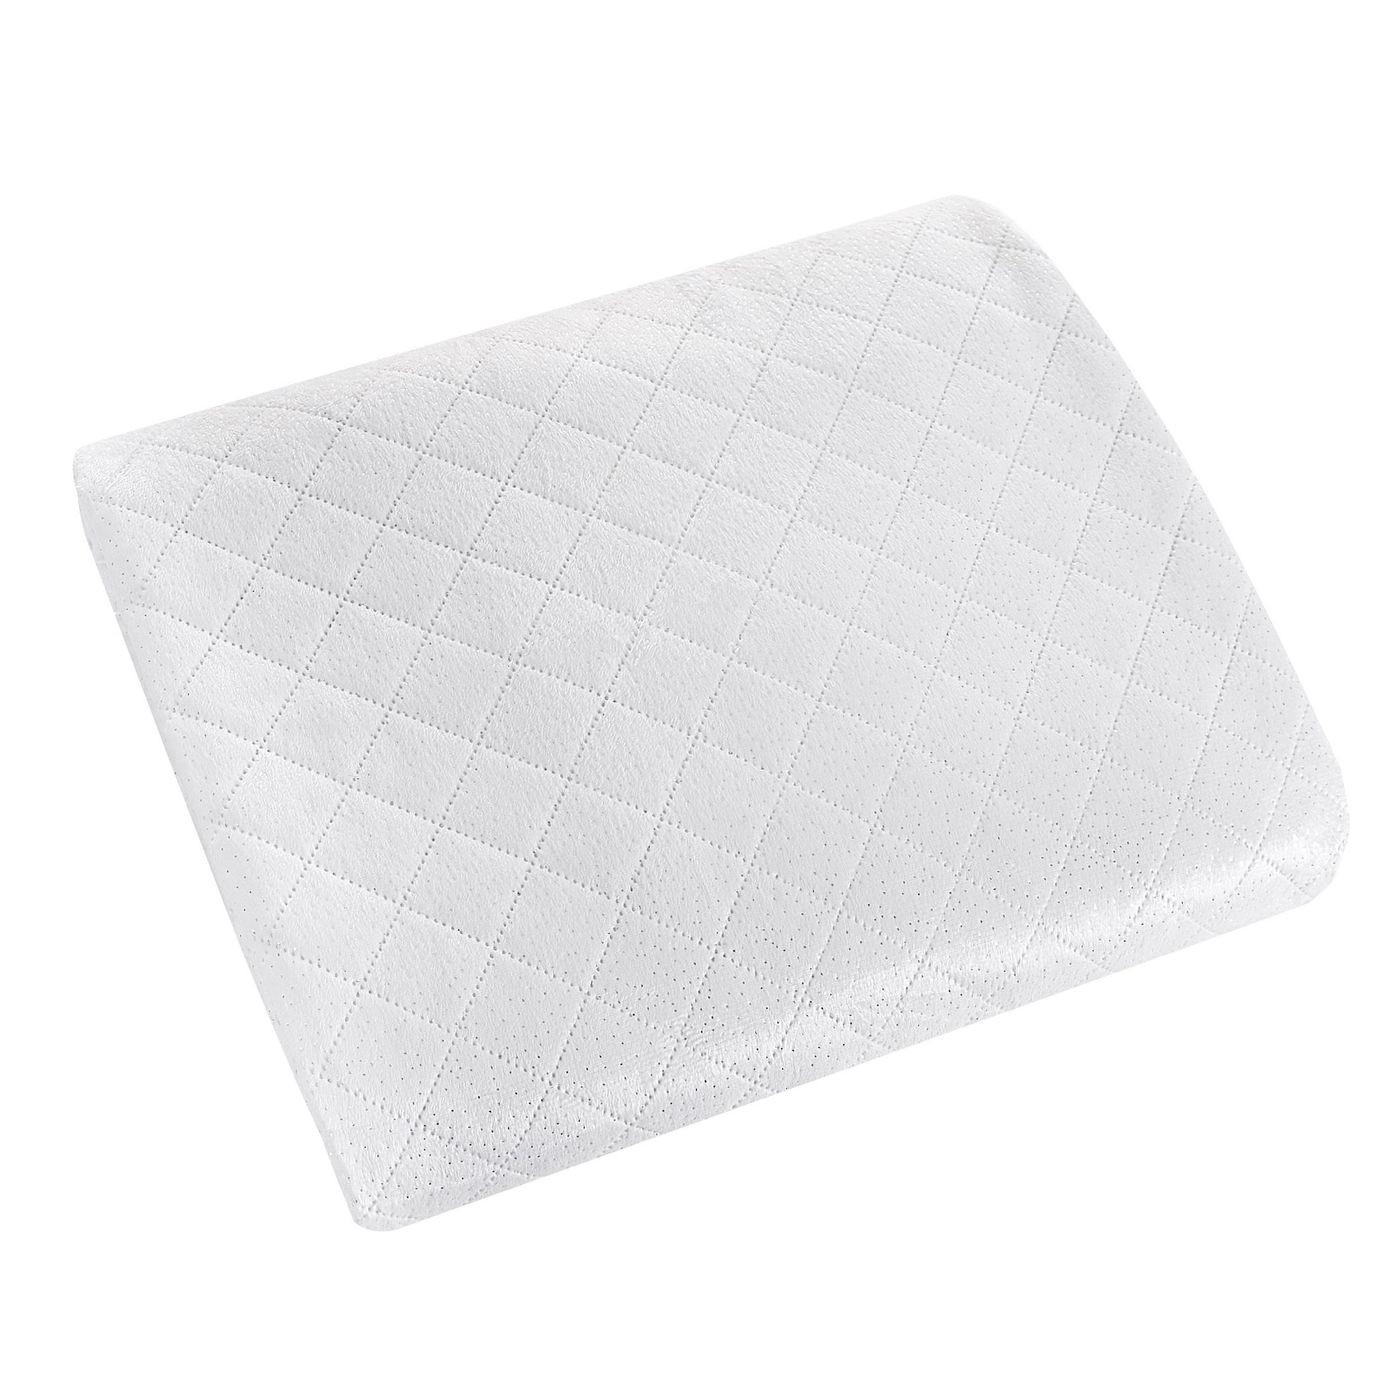 Narzuta na łóżko dwustronna welurowa 170x210 cm biało-srebrna